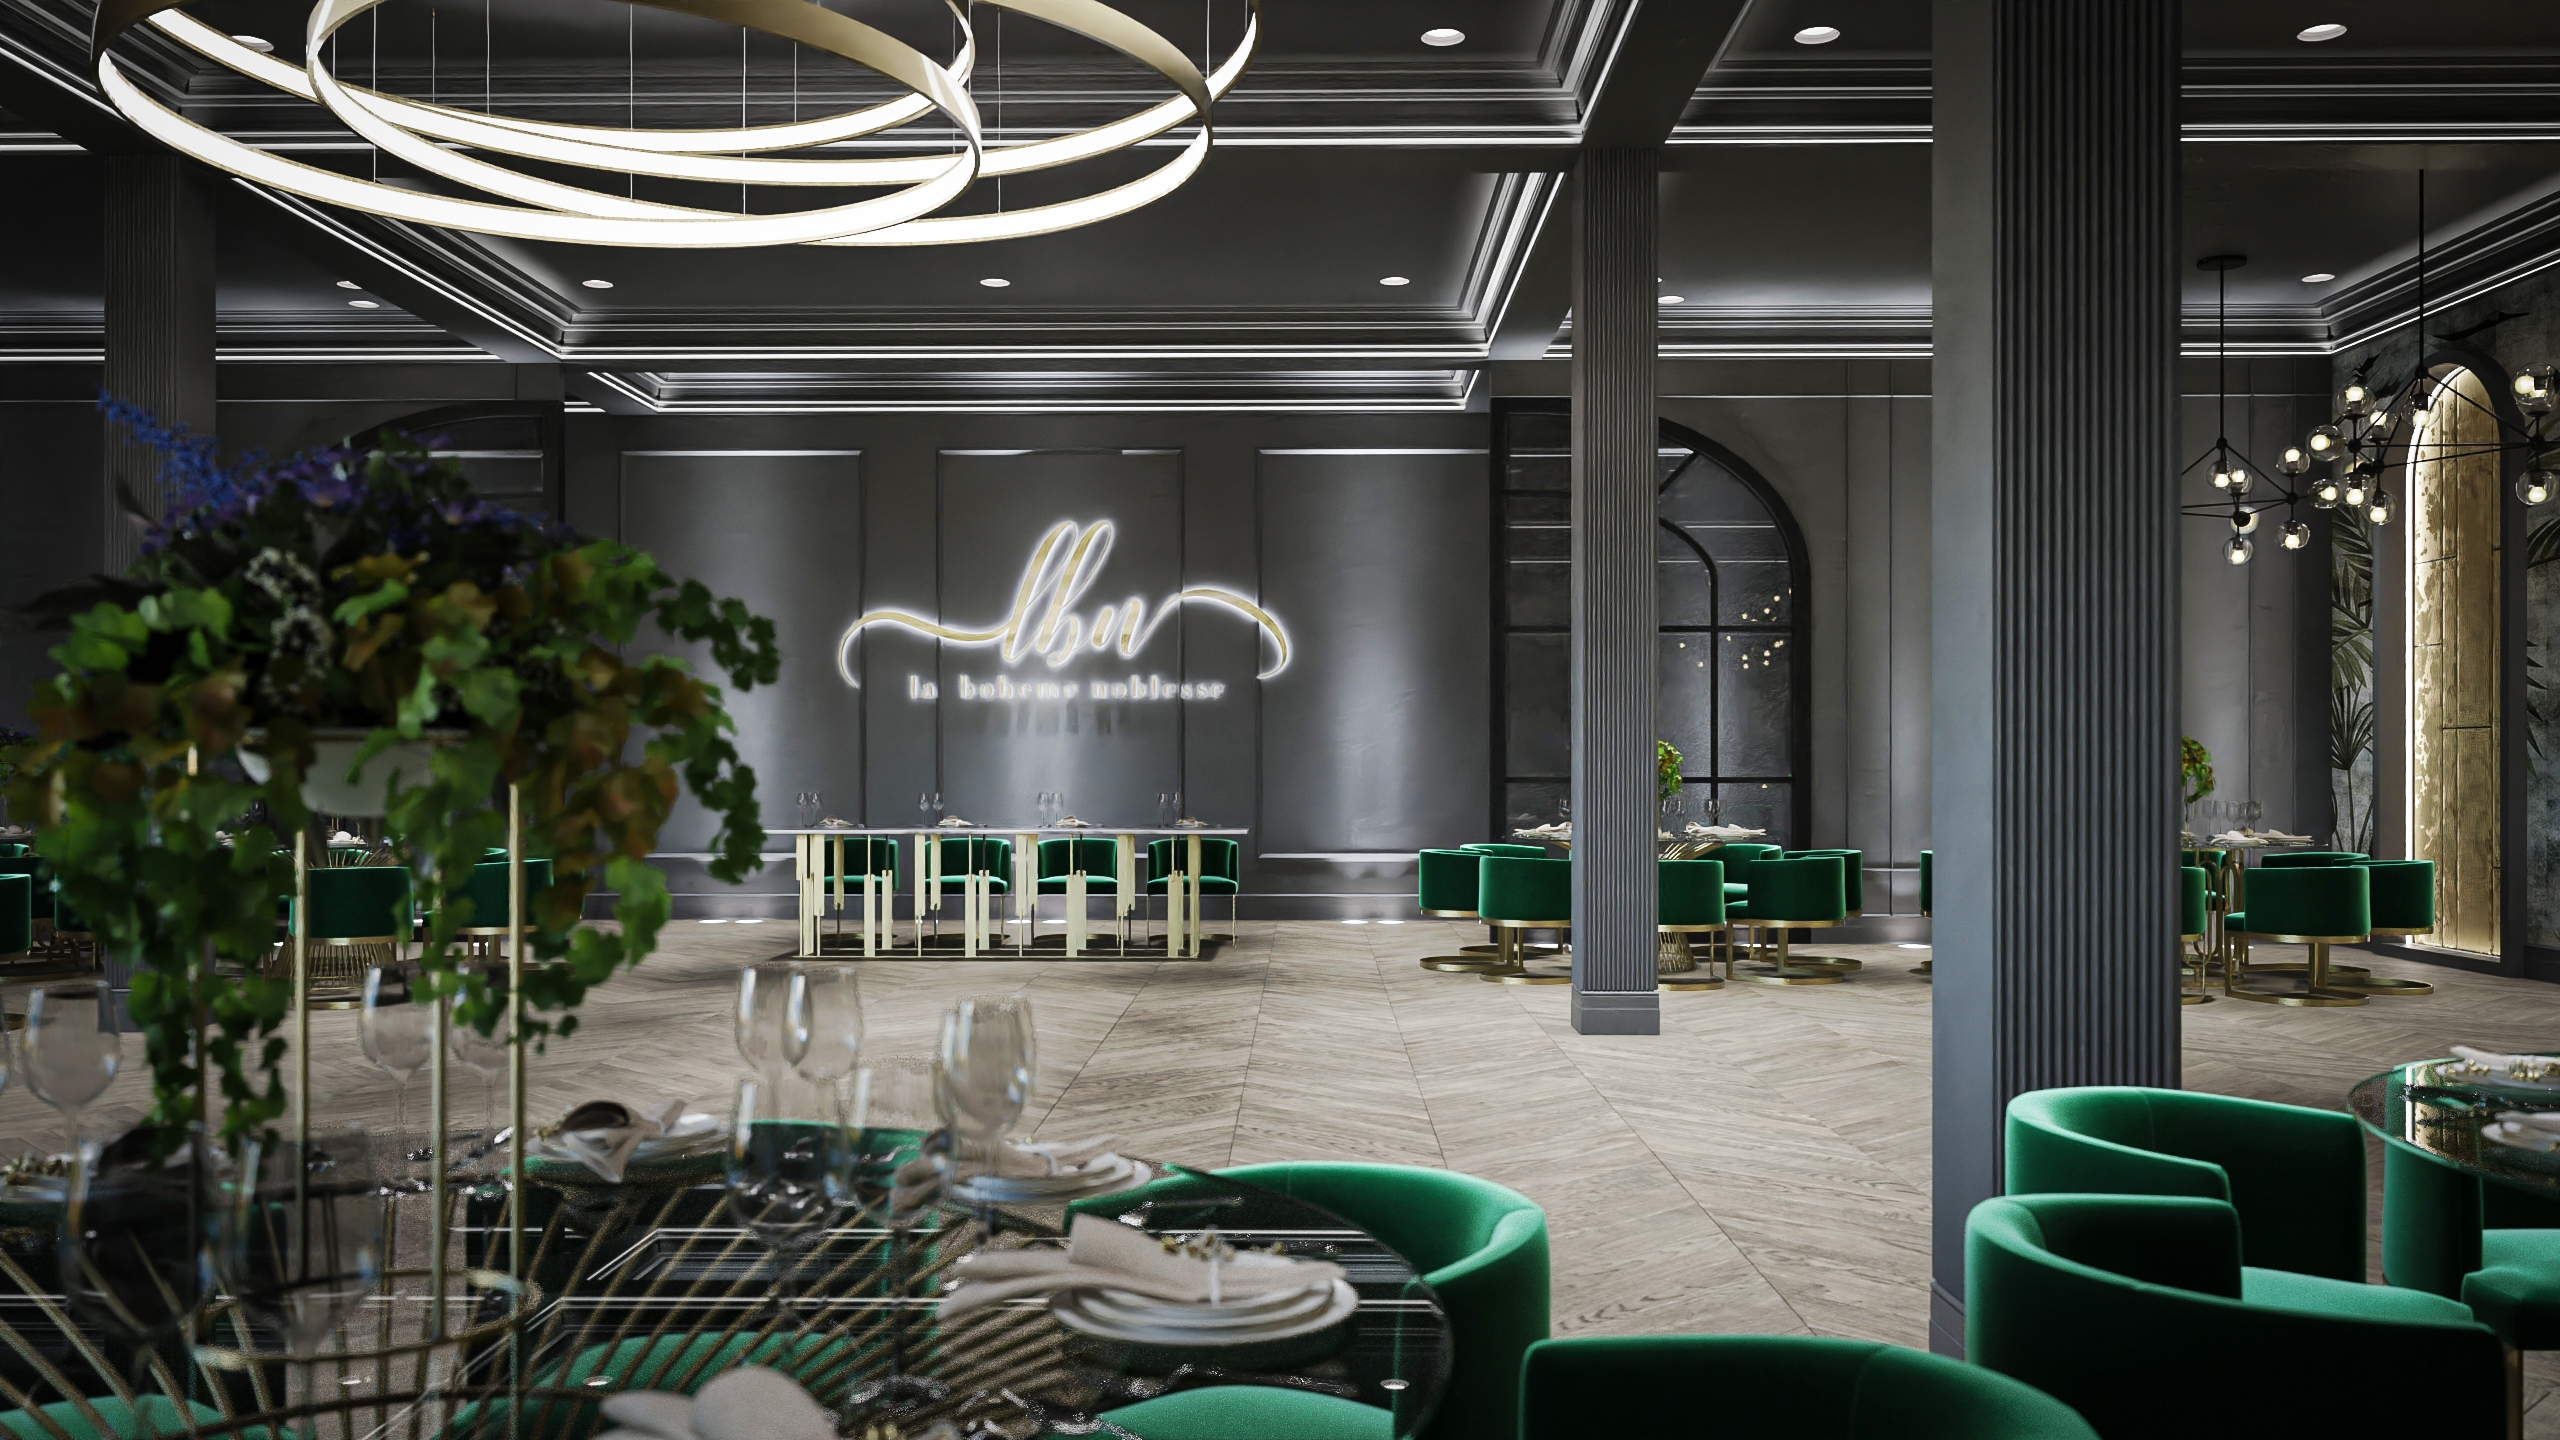 amenajare salon evenimente - arhitect Daliana Raducan